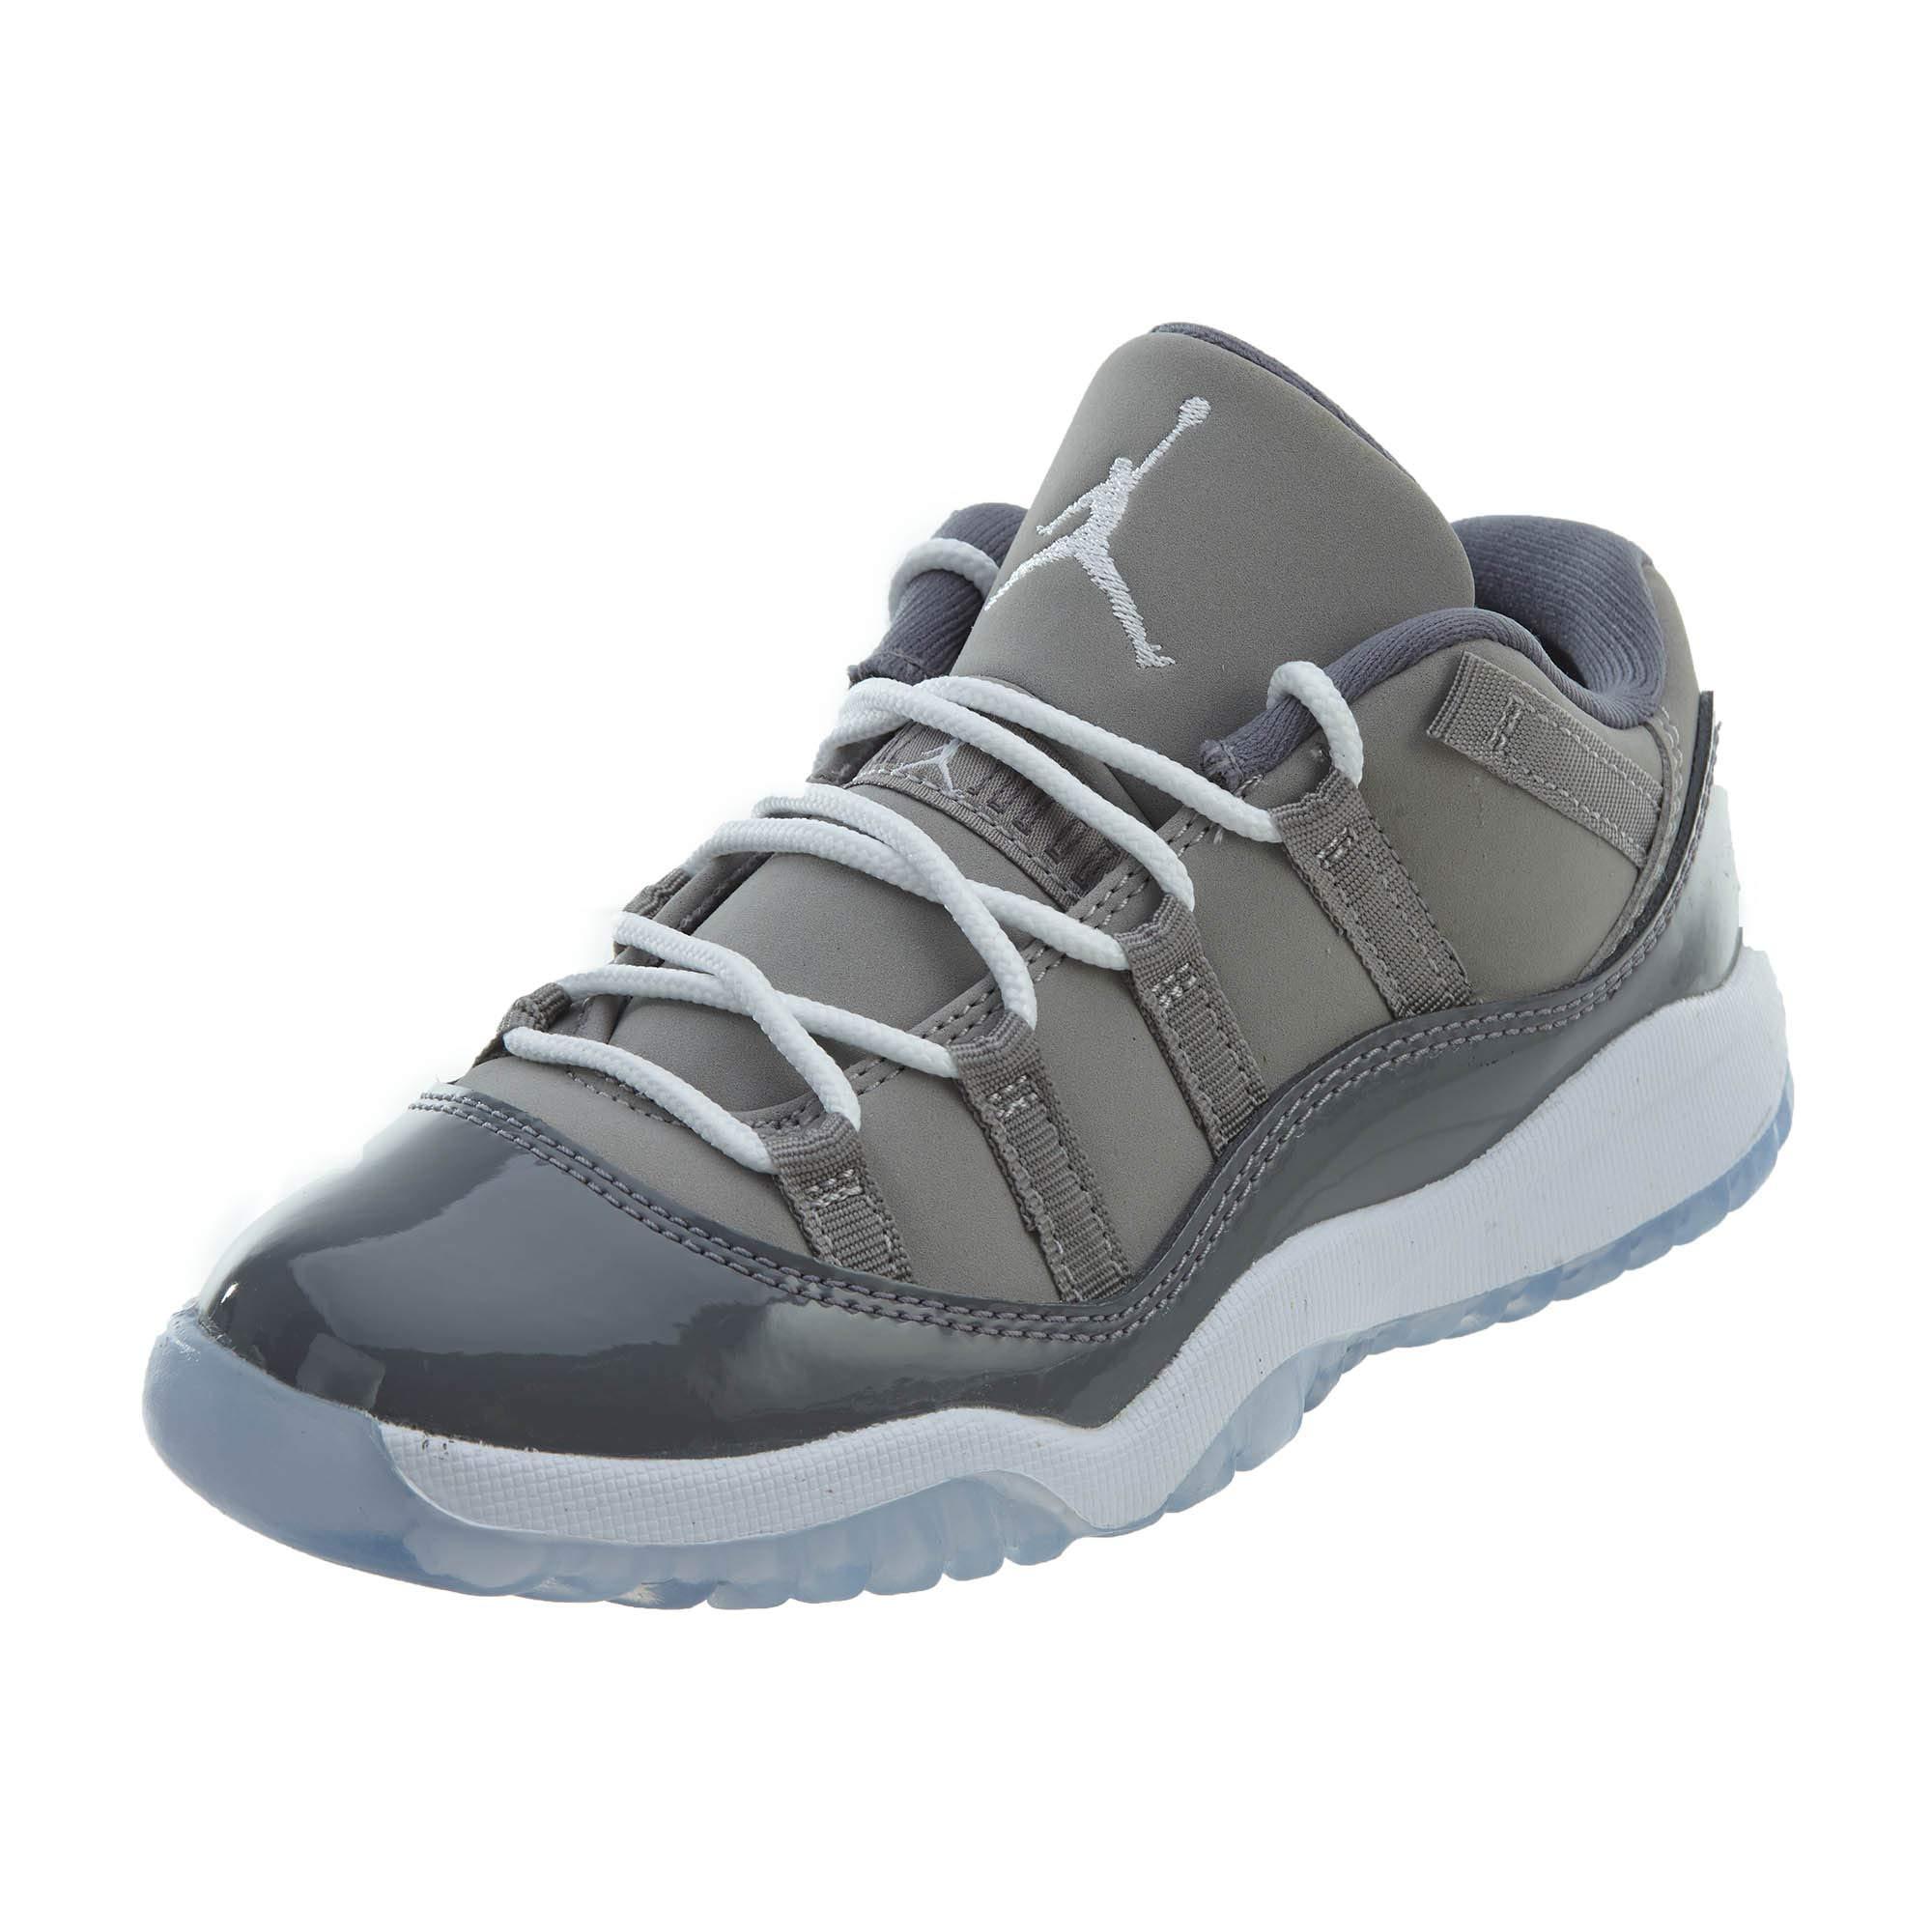 huge discount 1f3dd 6aaa0 Galleon - Nike Jordan Kids  Preschool Air Jordan 11 Retro Low Basketball  Shoes (2, Grey White Gunsmoke)